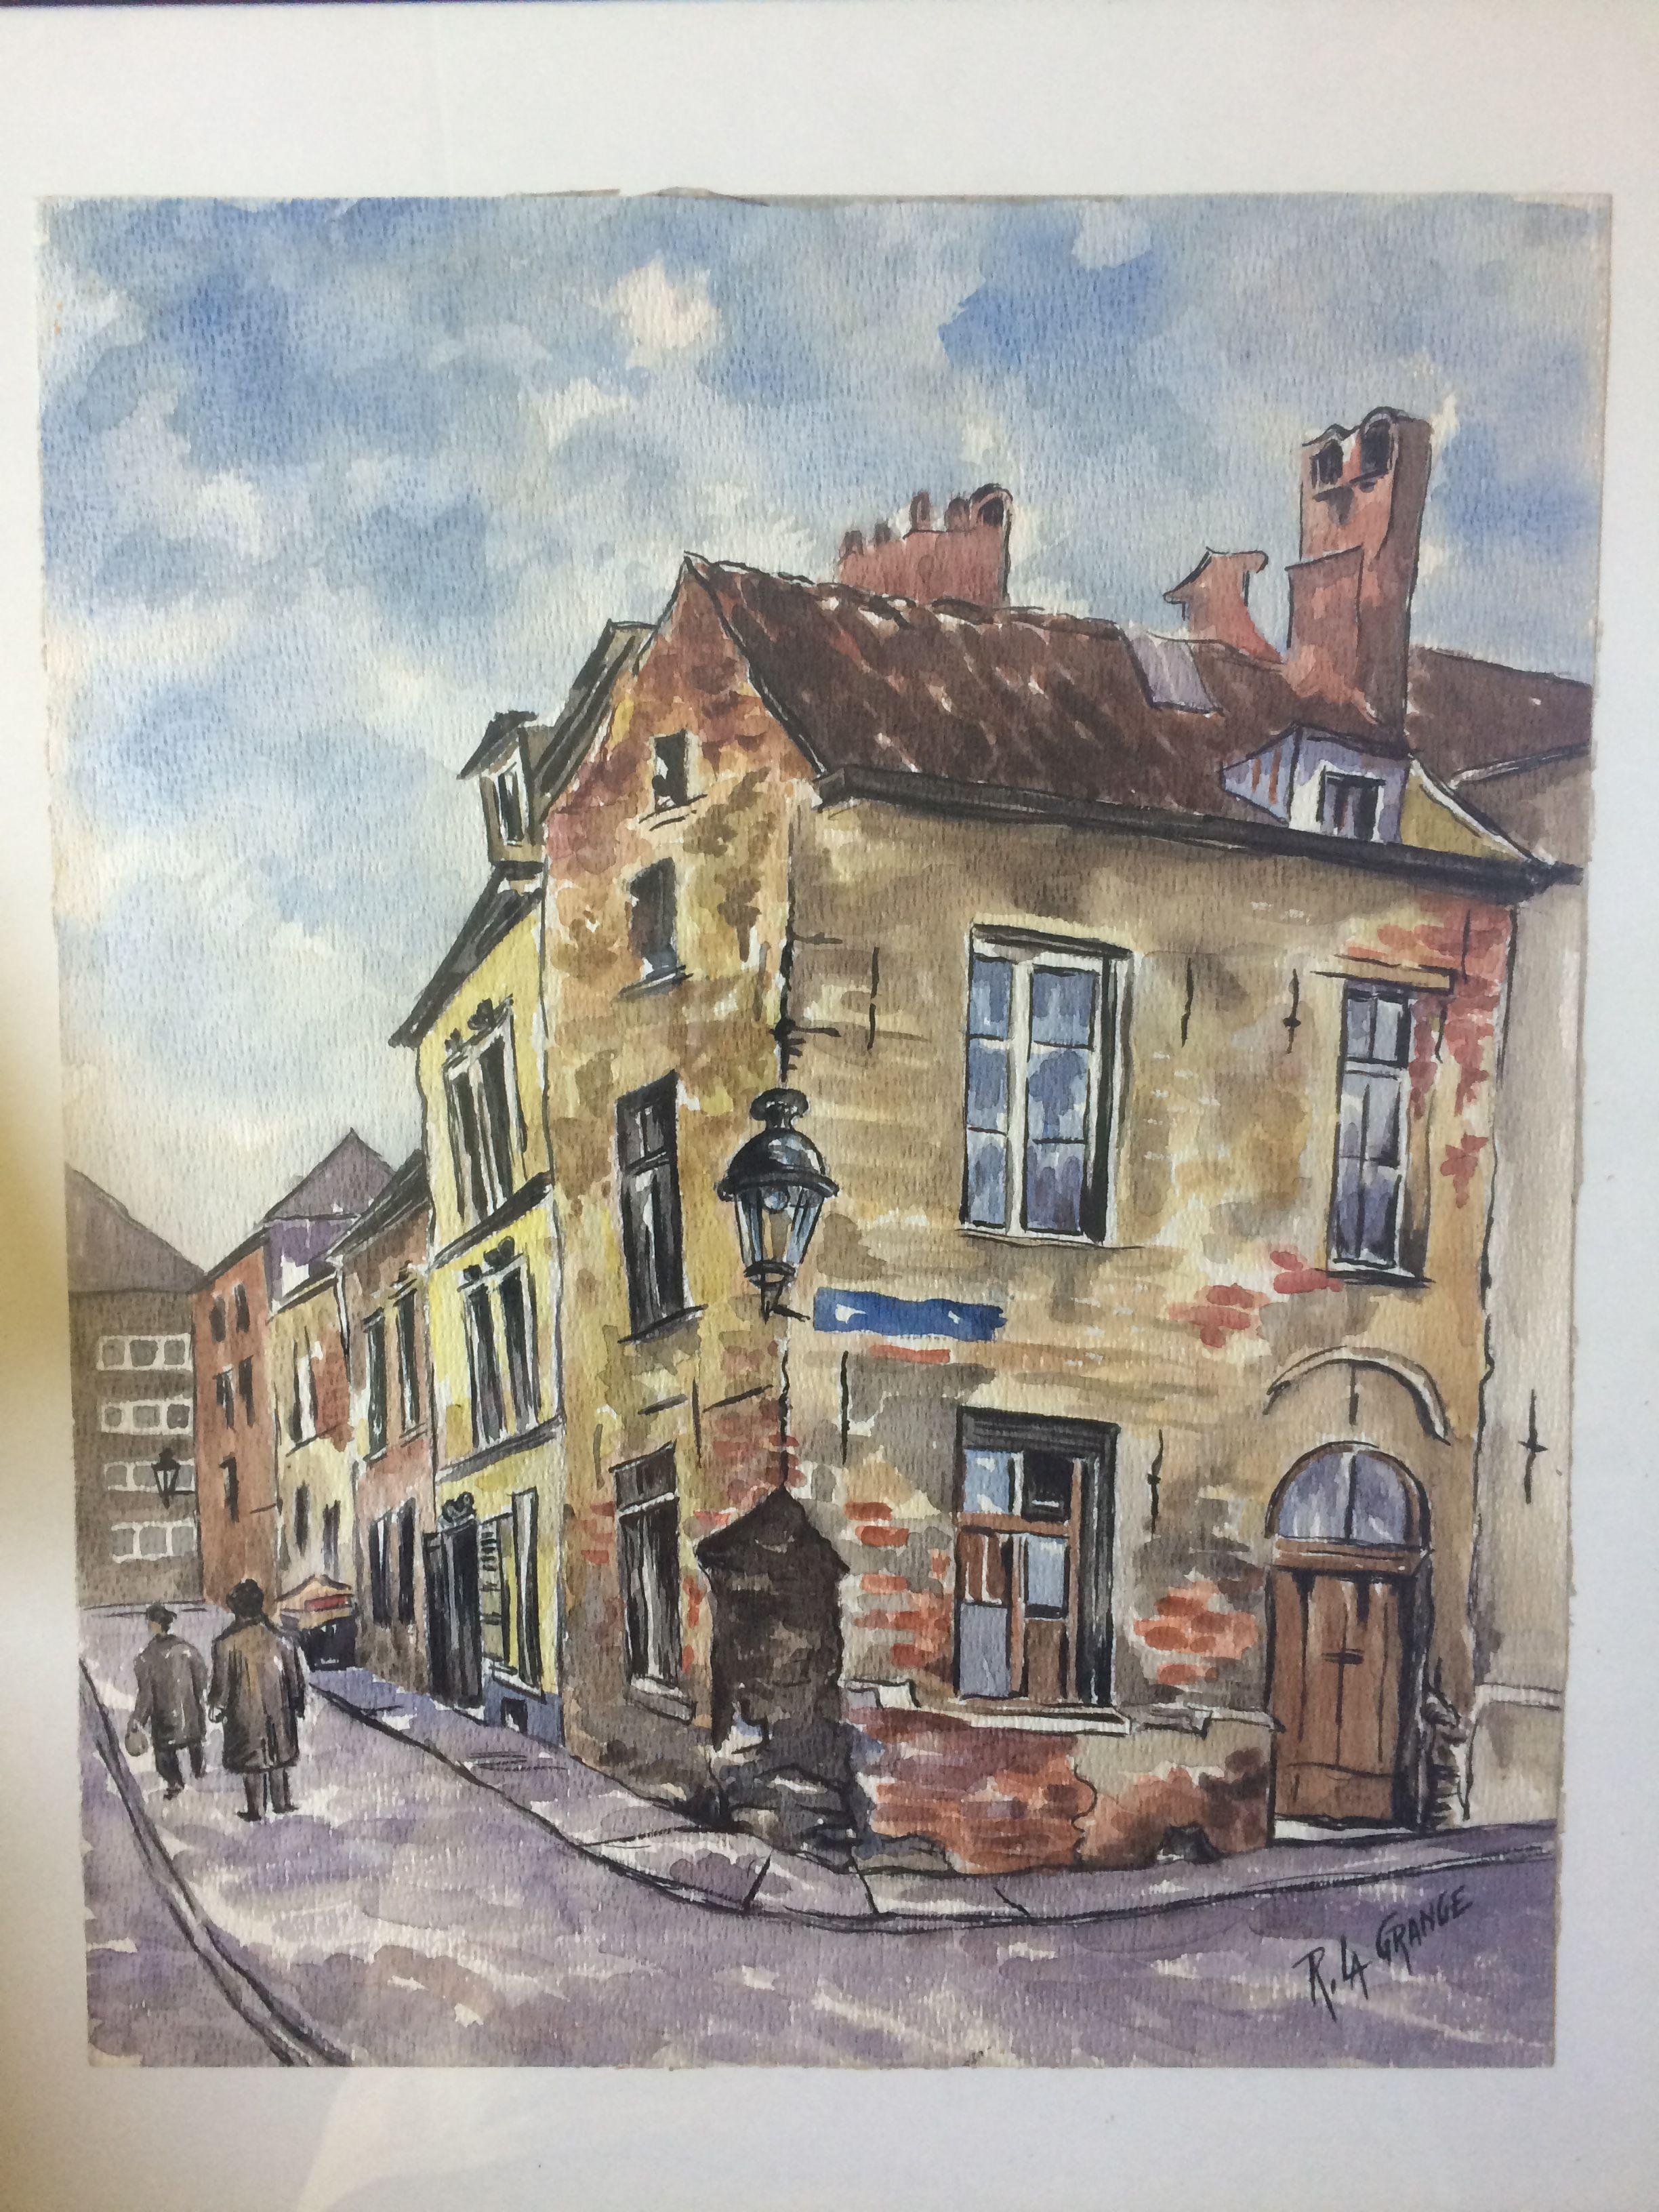 François Robert La Grange (1891-?). Rue des quatre fils @Paris Techniek: Watercolor